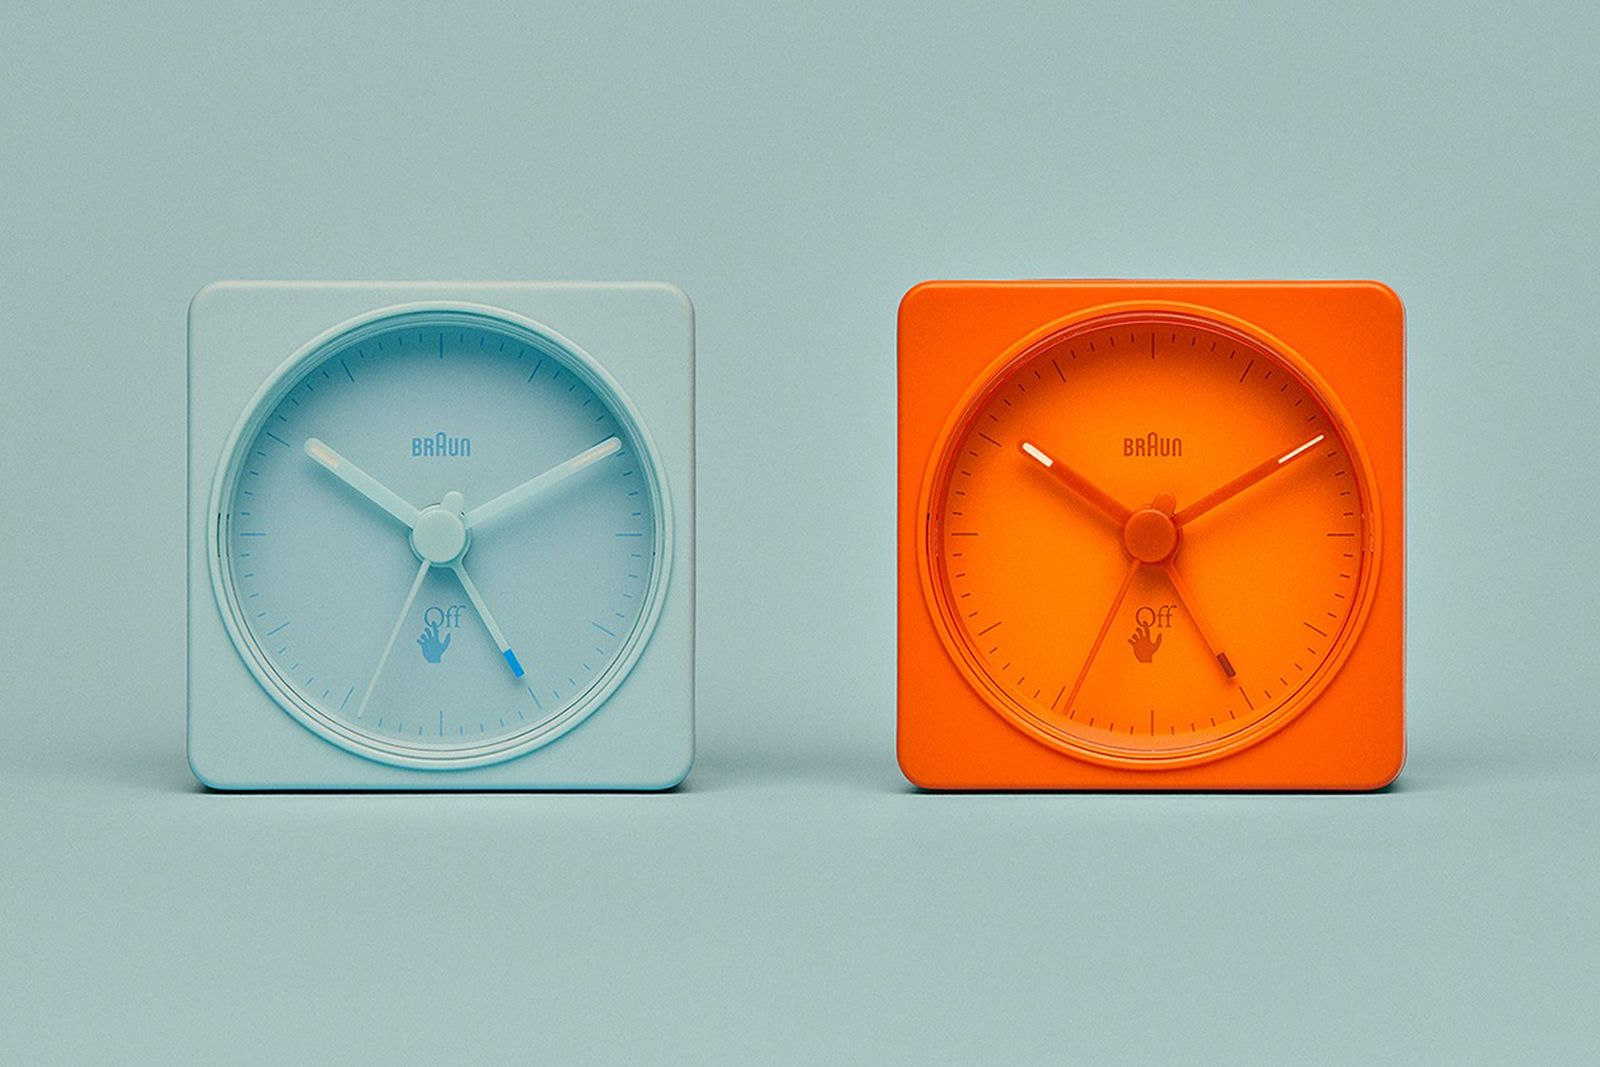 virgil-abloh-off-white-braun-alarm-clock-03